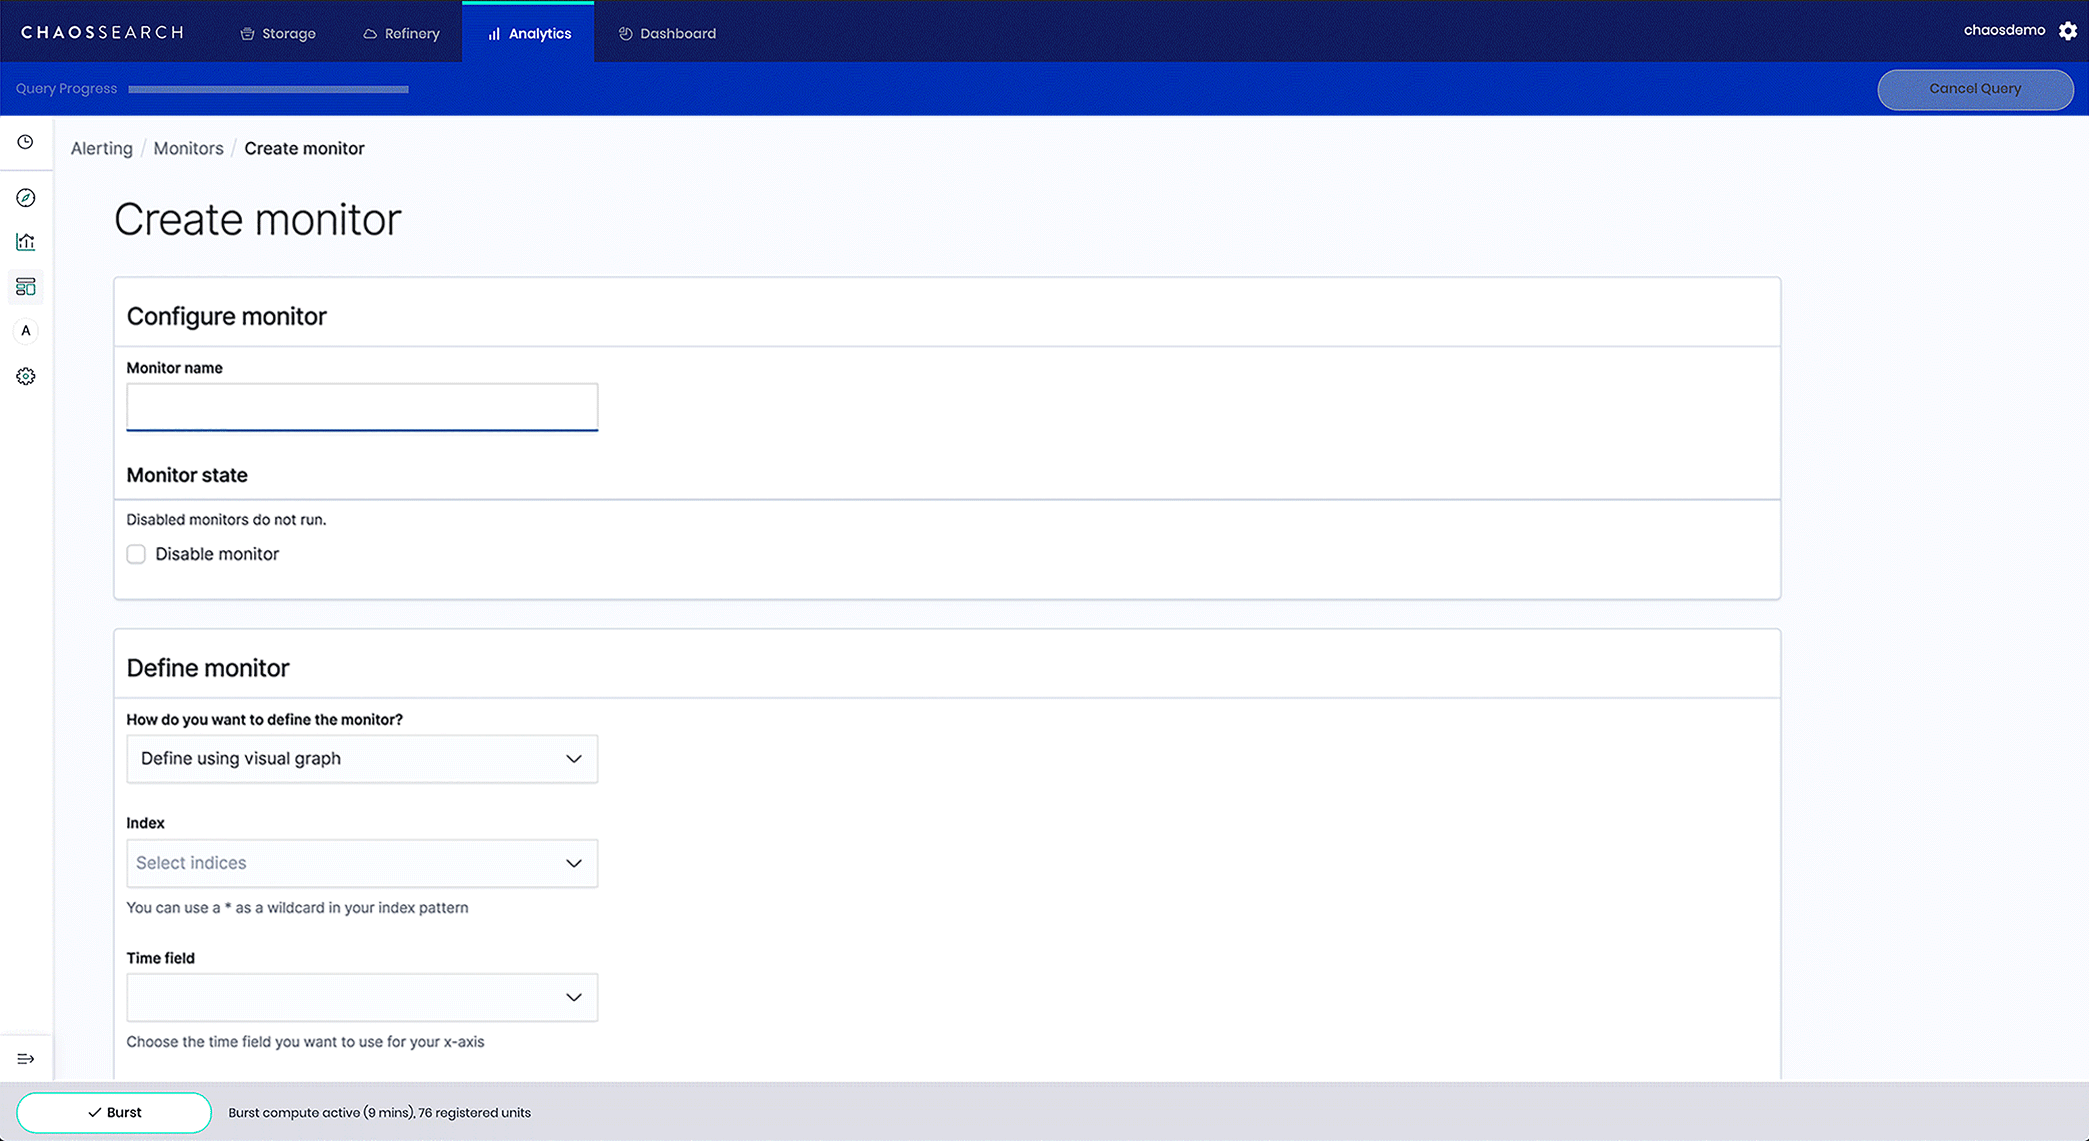 Alerting-Create-Define-Monitor-2089x1142-150dpi